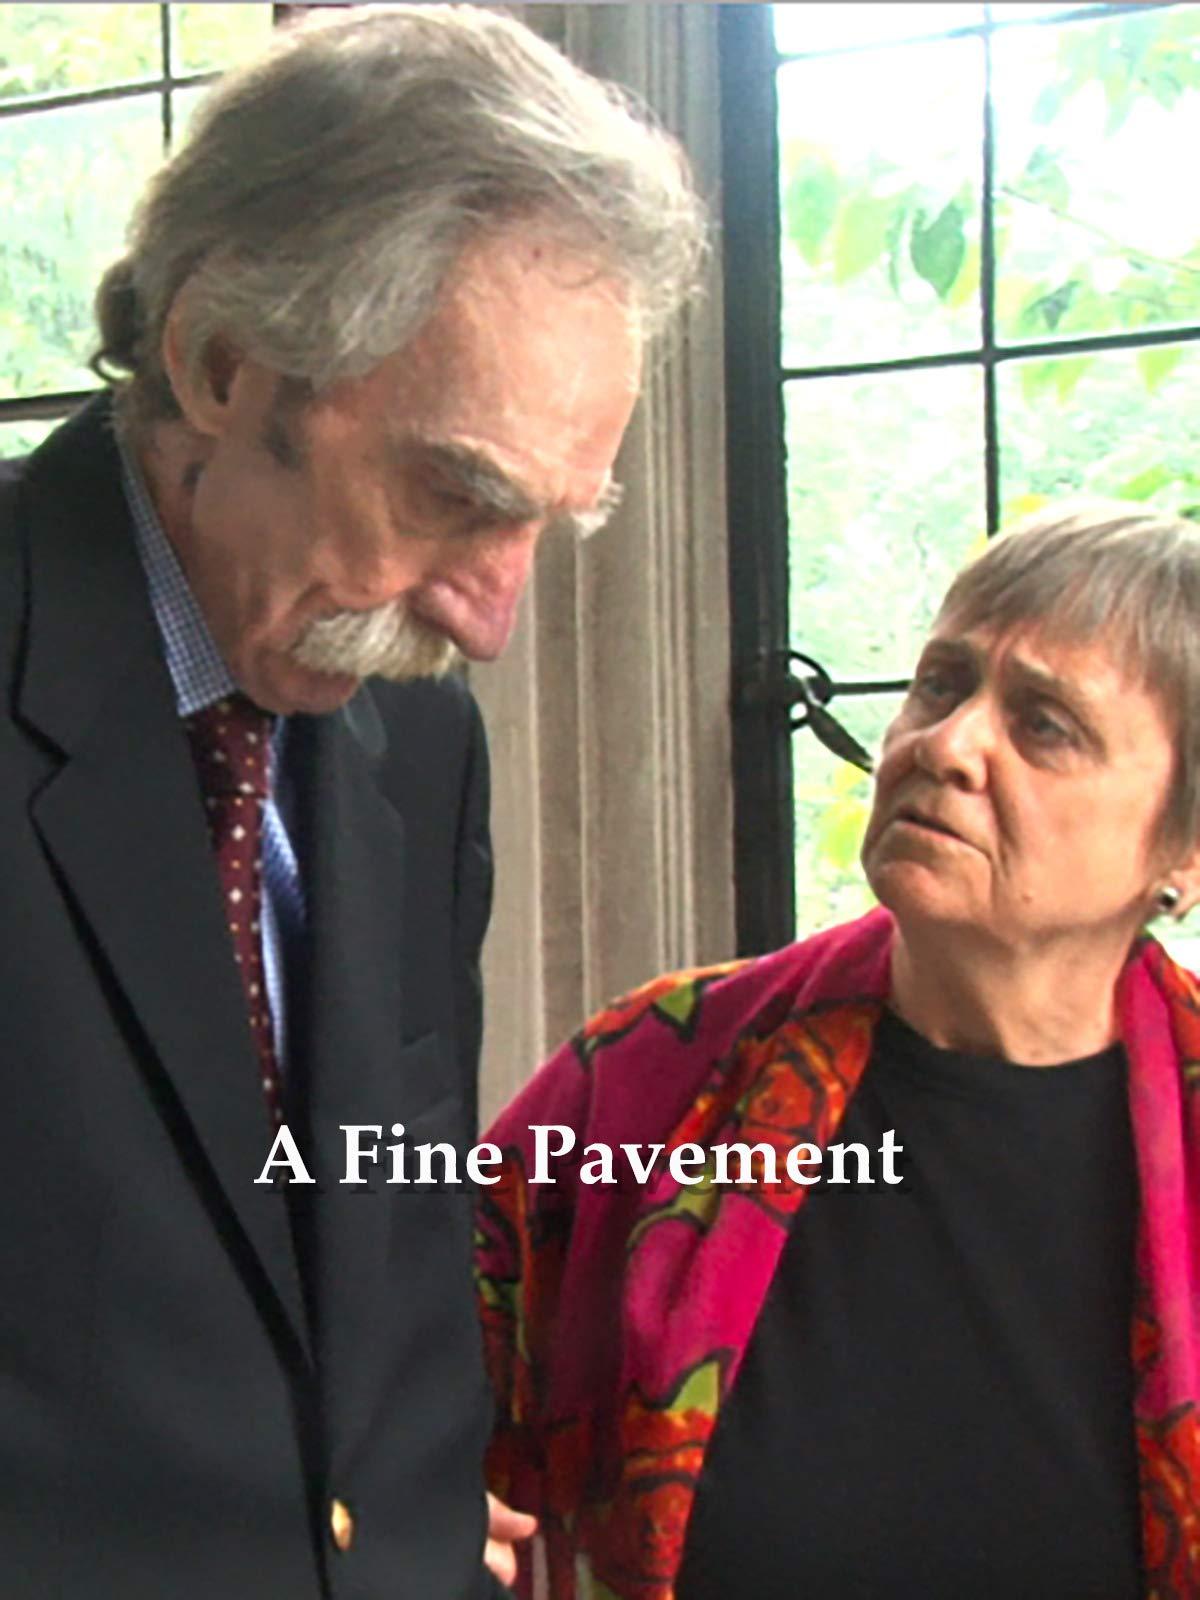 A Fine Pavement